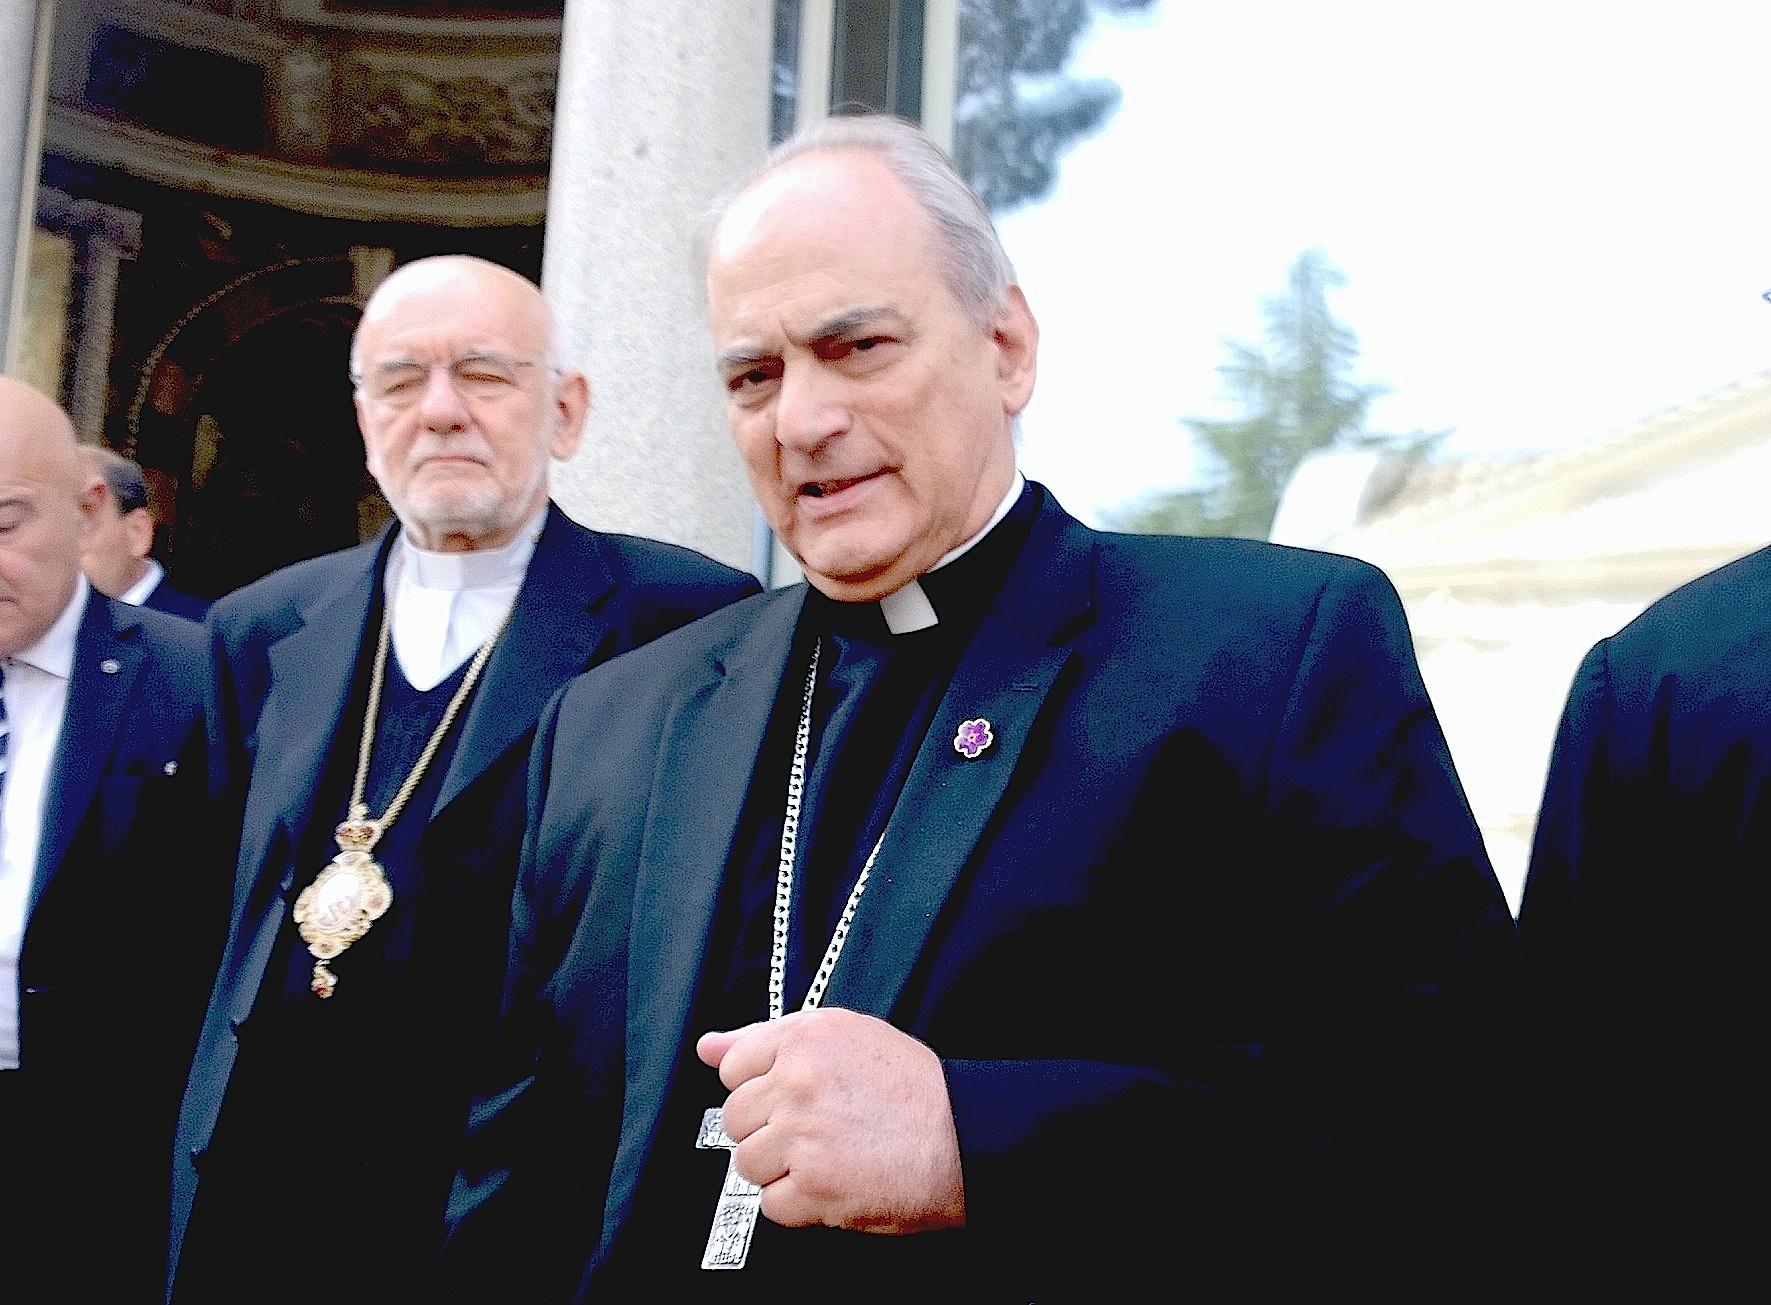 Mons. Sánchez Sorondo